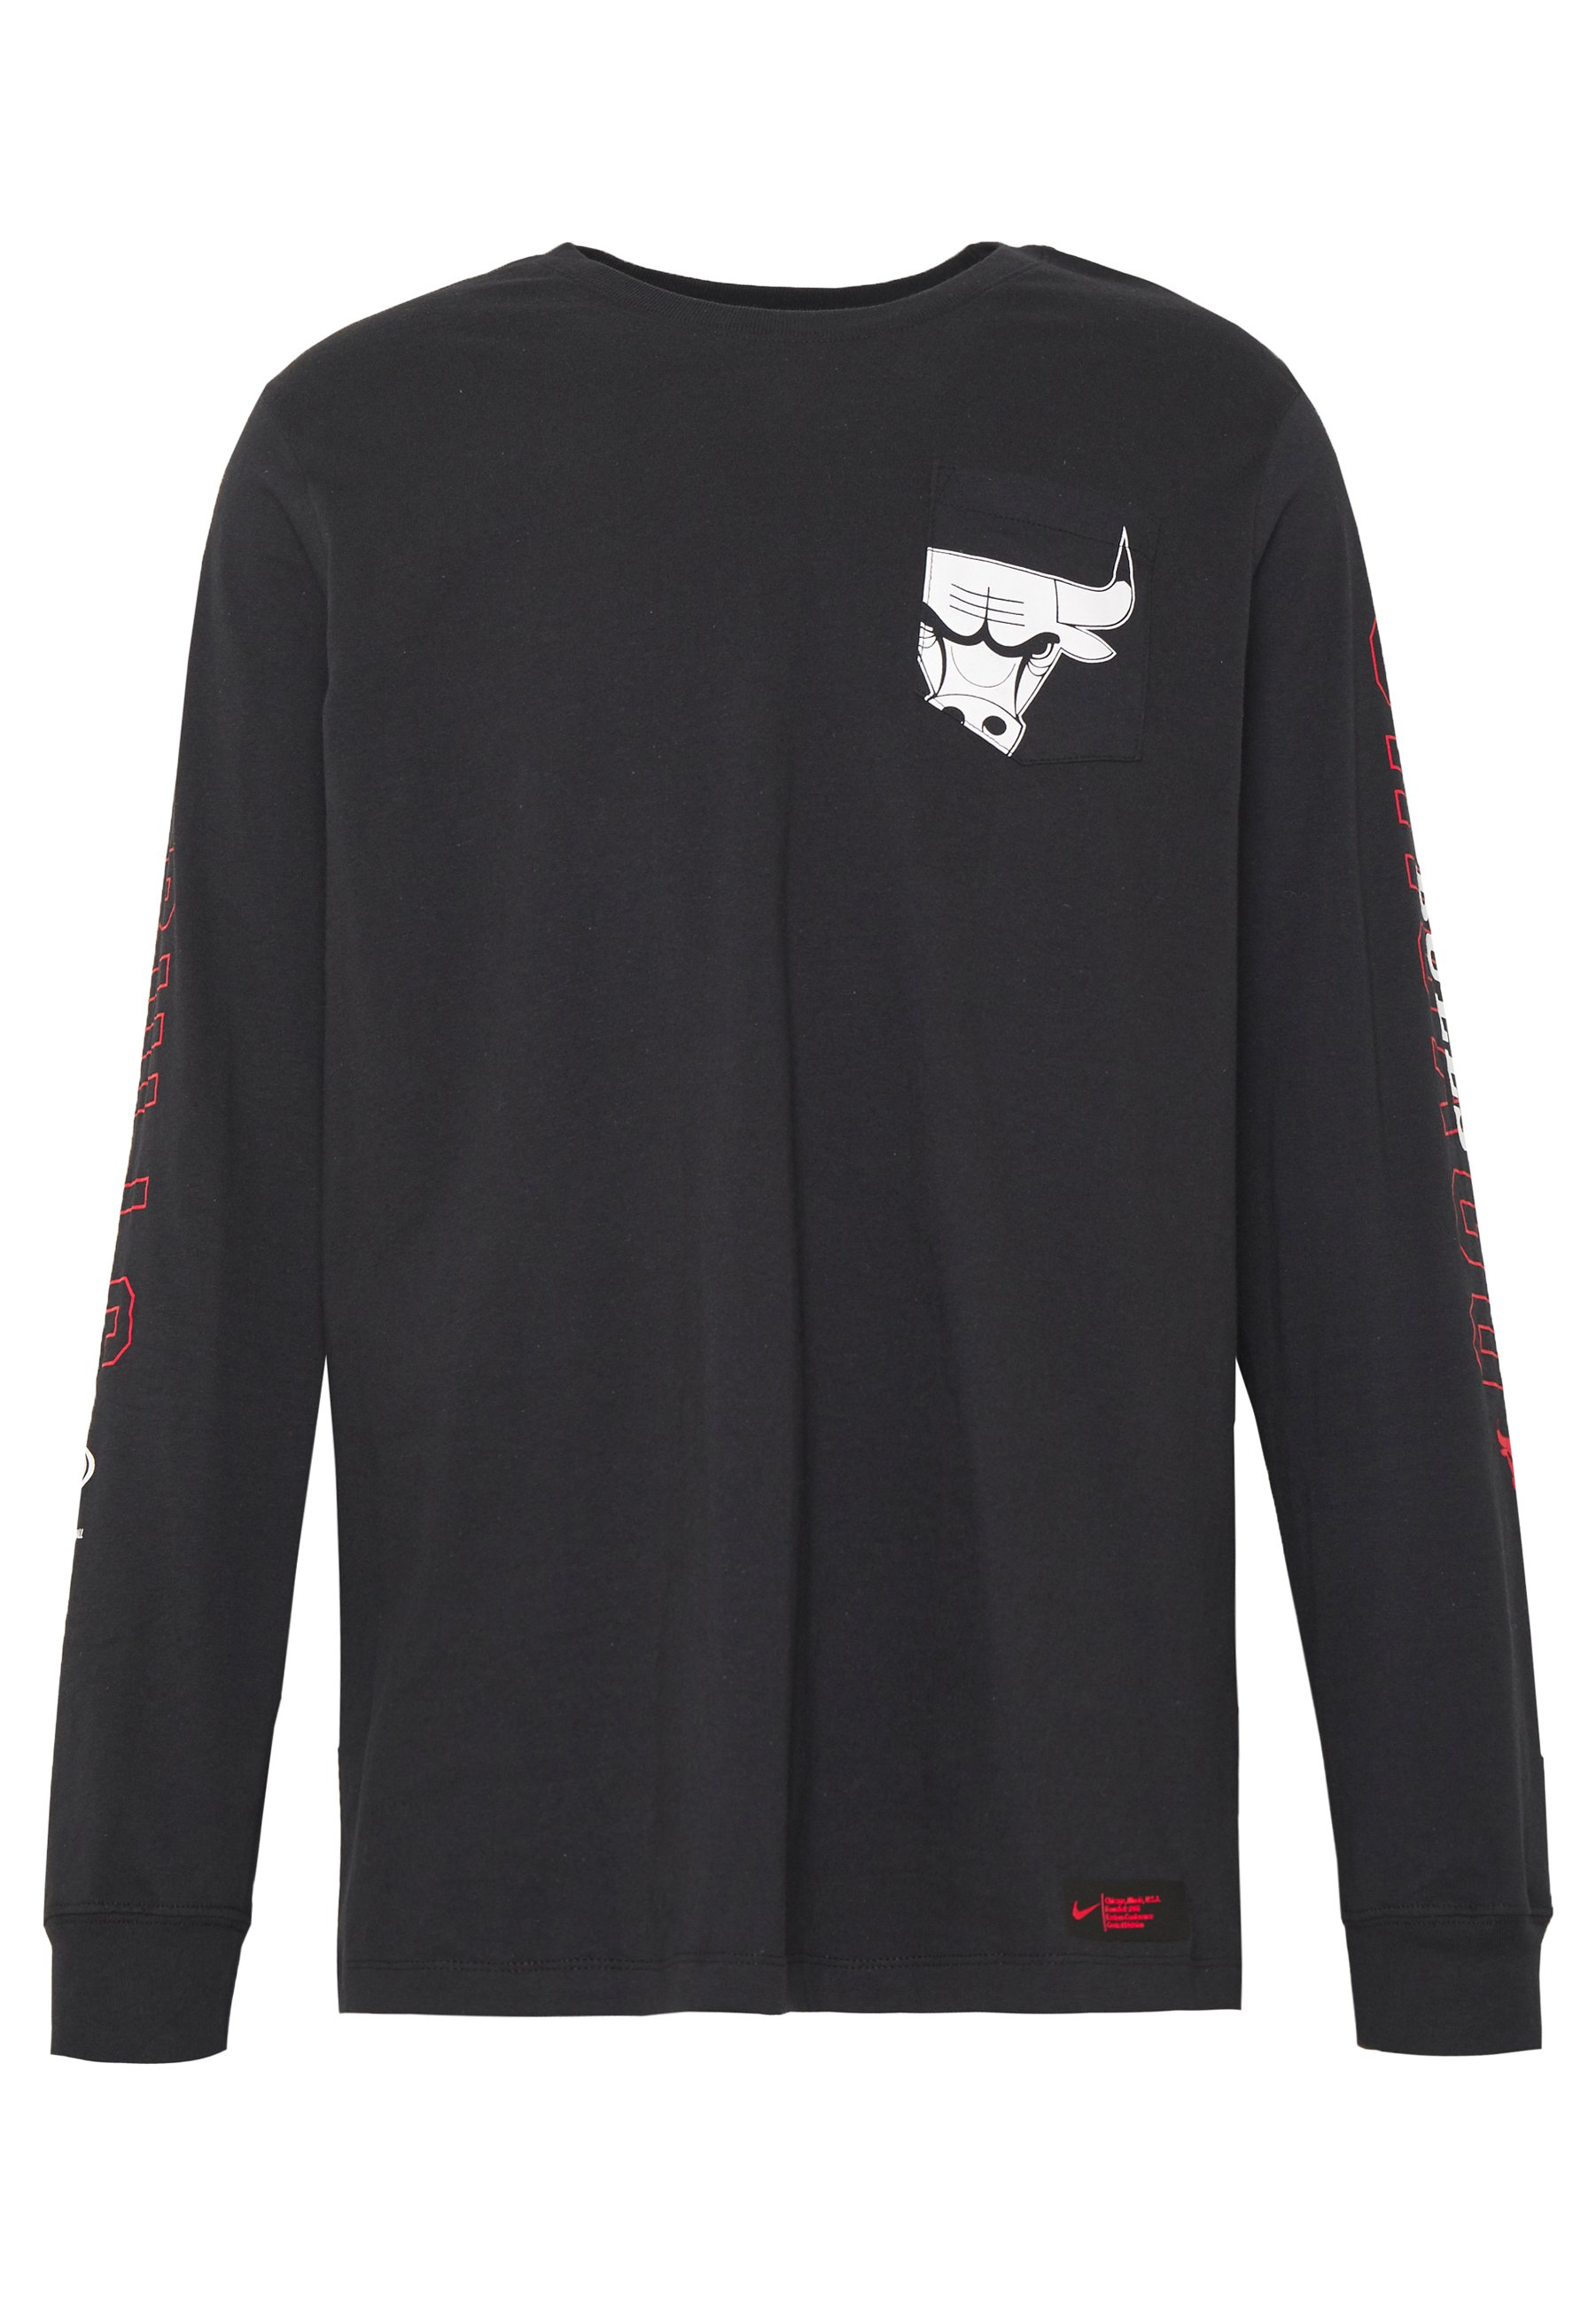 Nike Performance Nba Chicago Bulls Long Sleeve - Klubbkläder Black